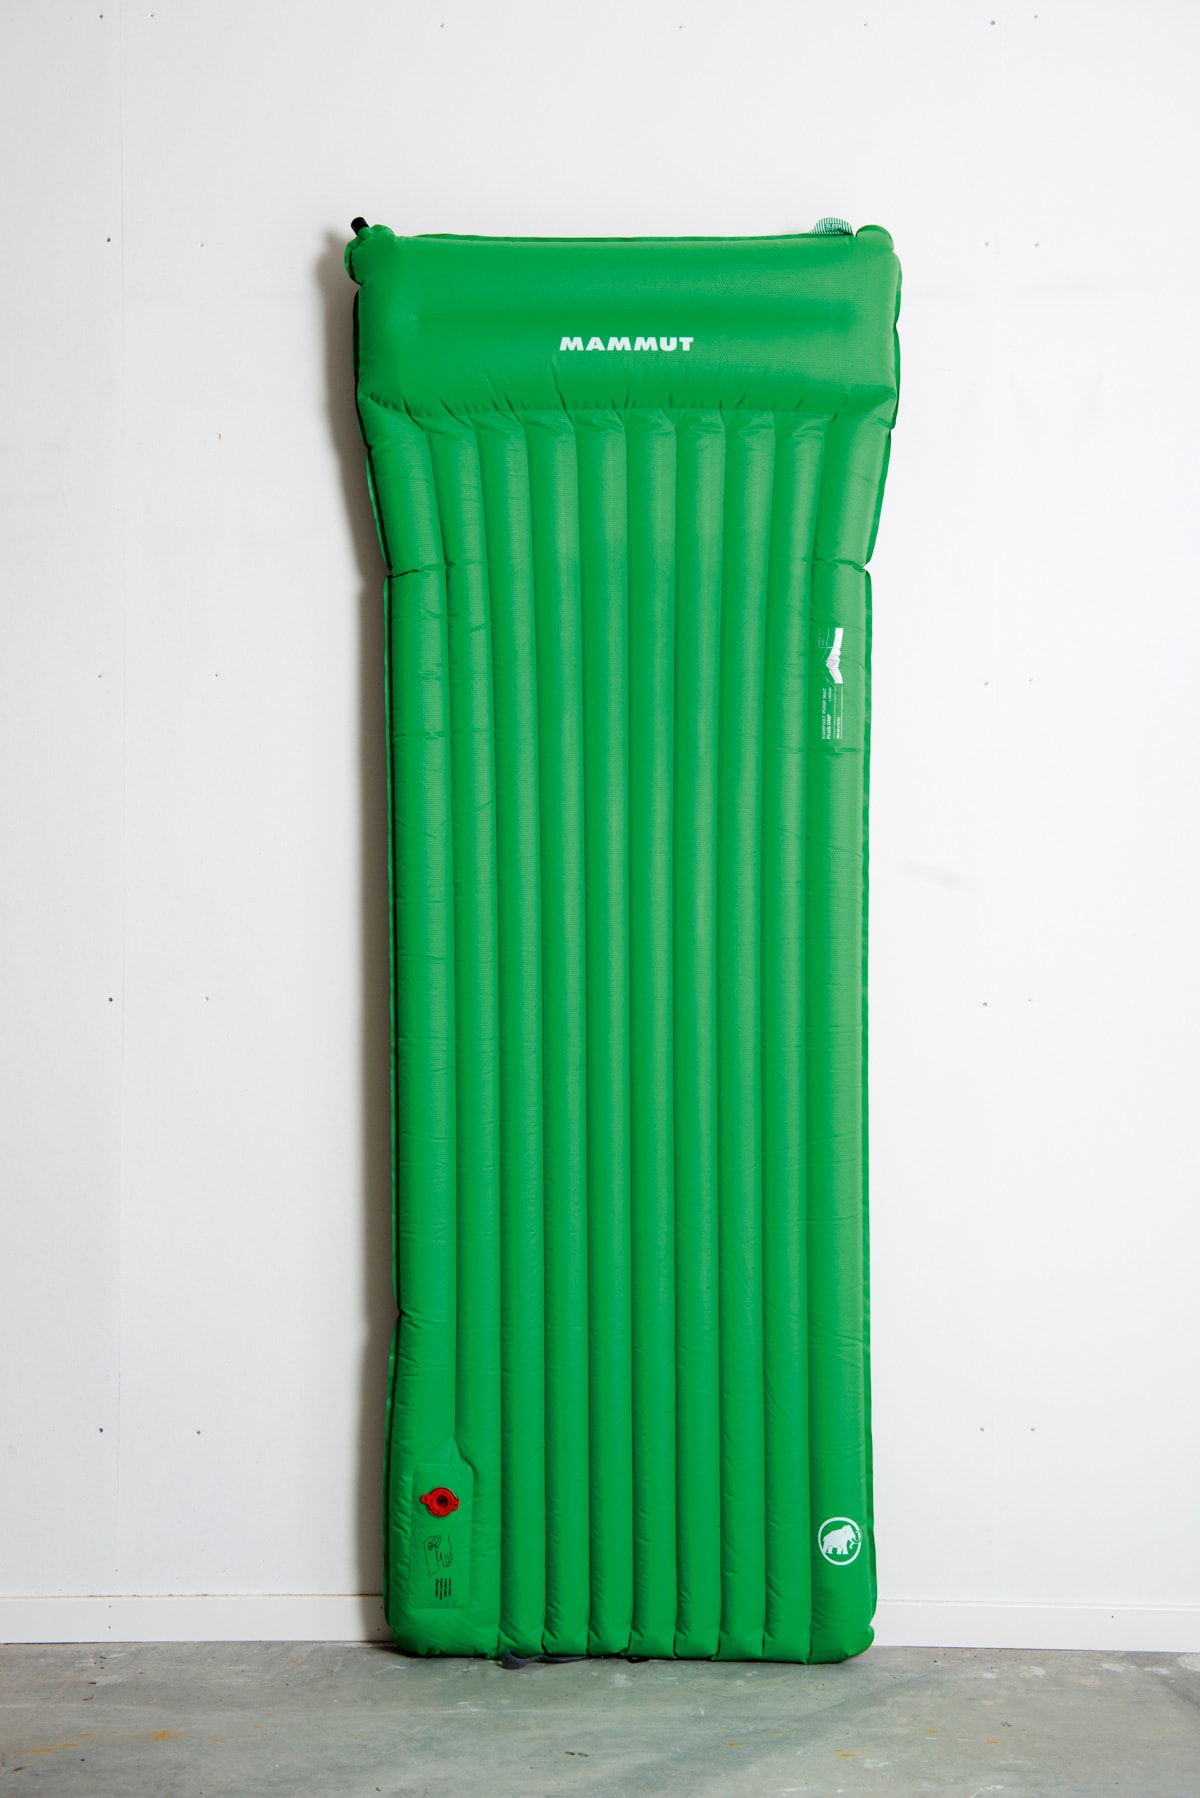 Mammut Kompakt Pump Mat Plus CFT